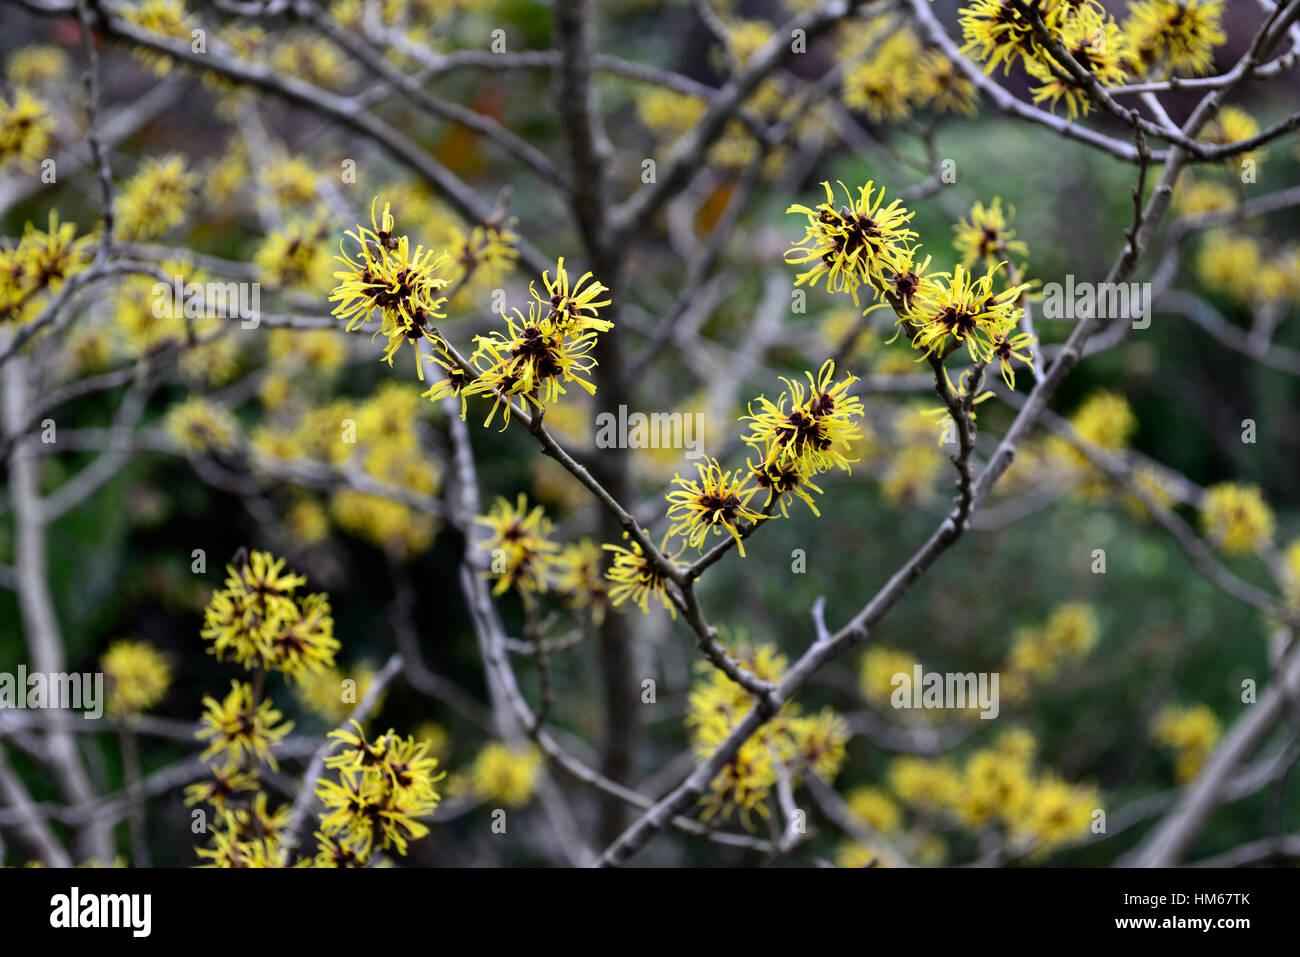 Hamamelis Mollis Chinese Witch Hazel Winter Yellow Hazels Scented